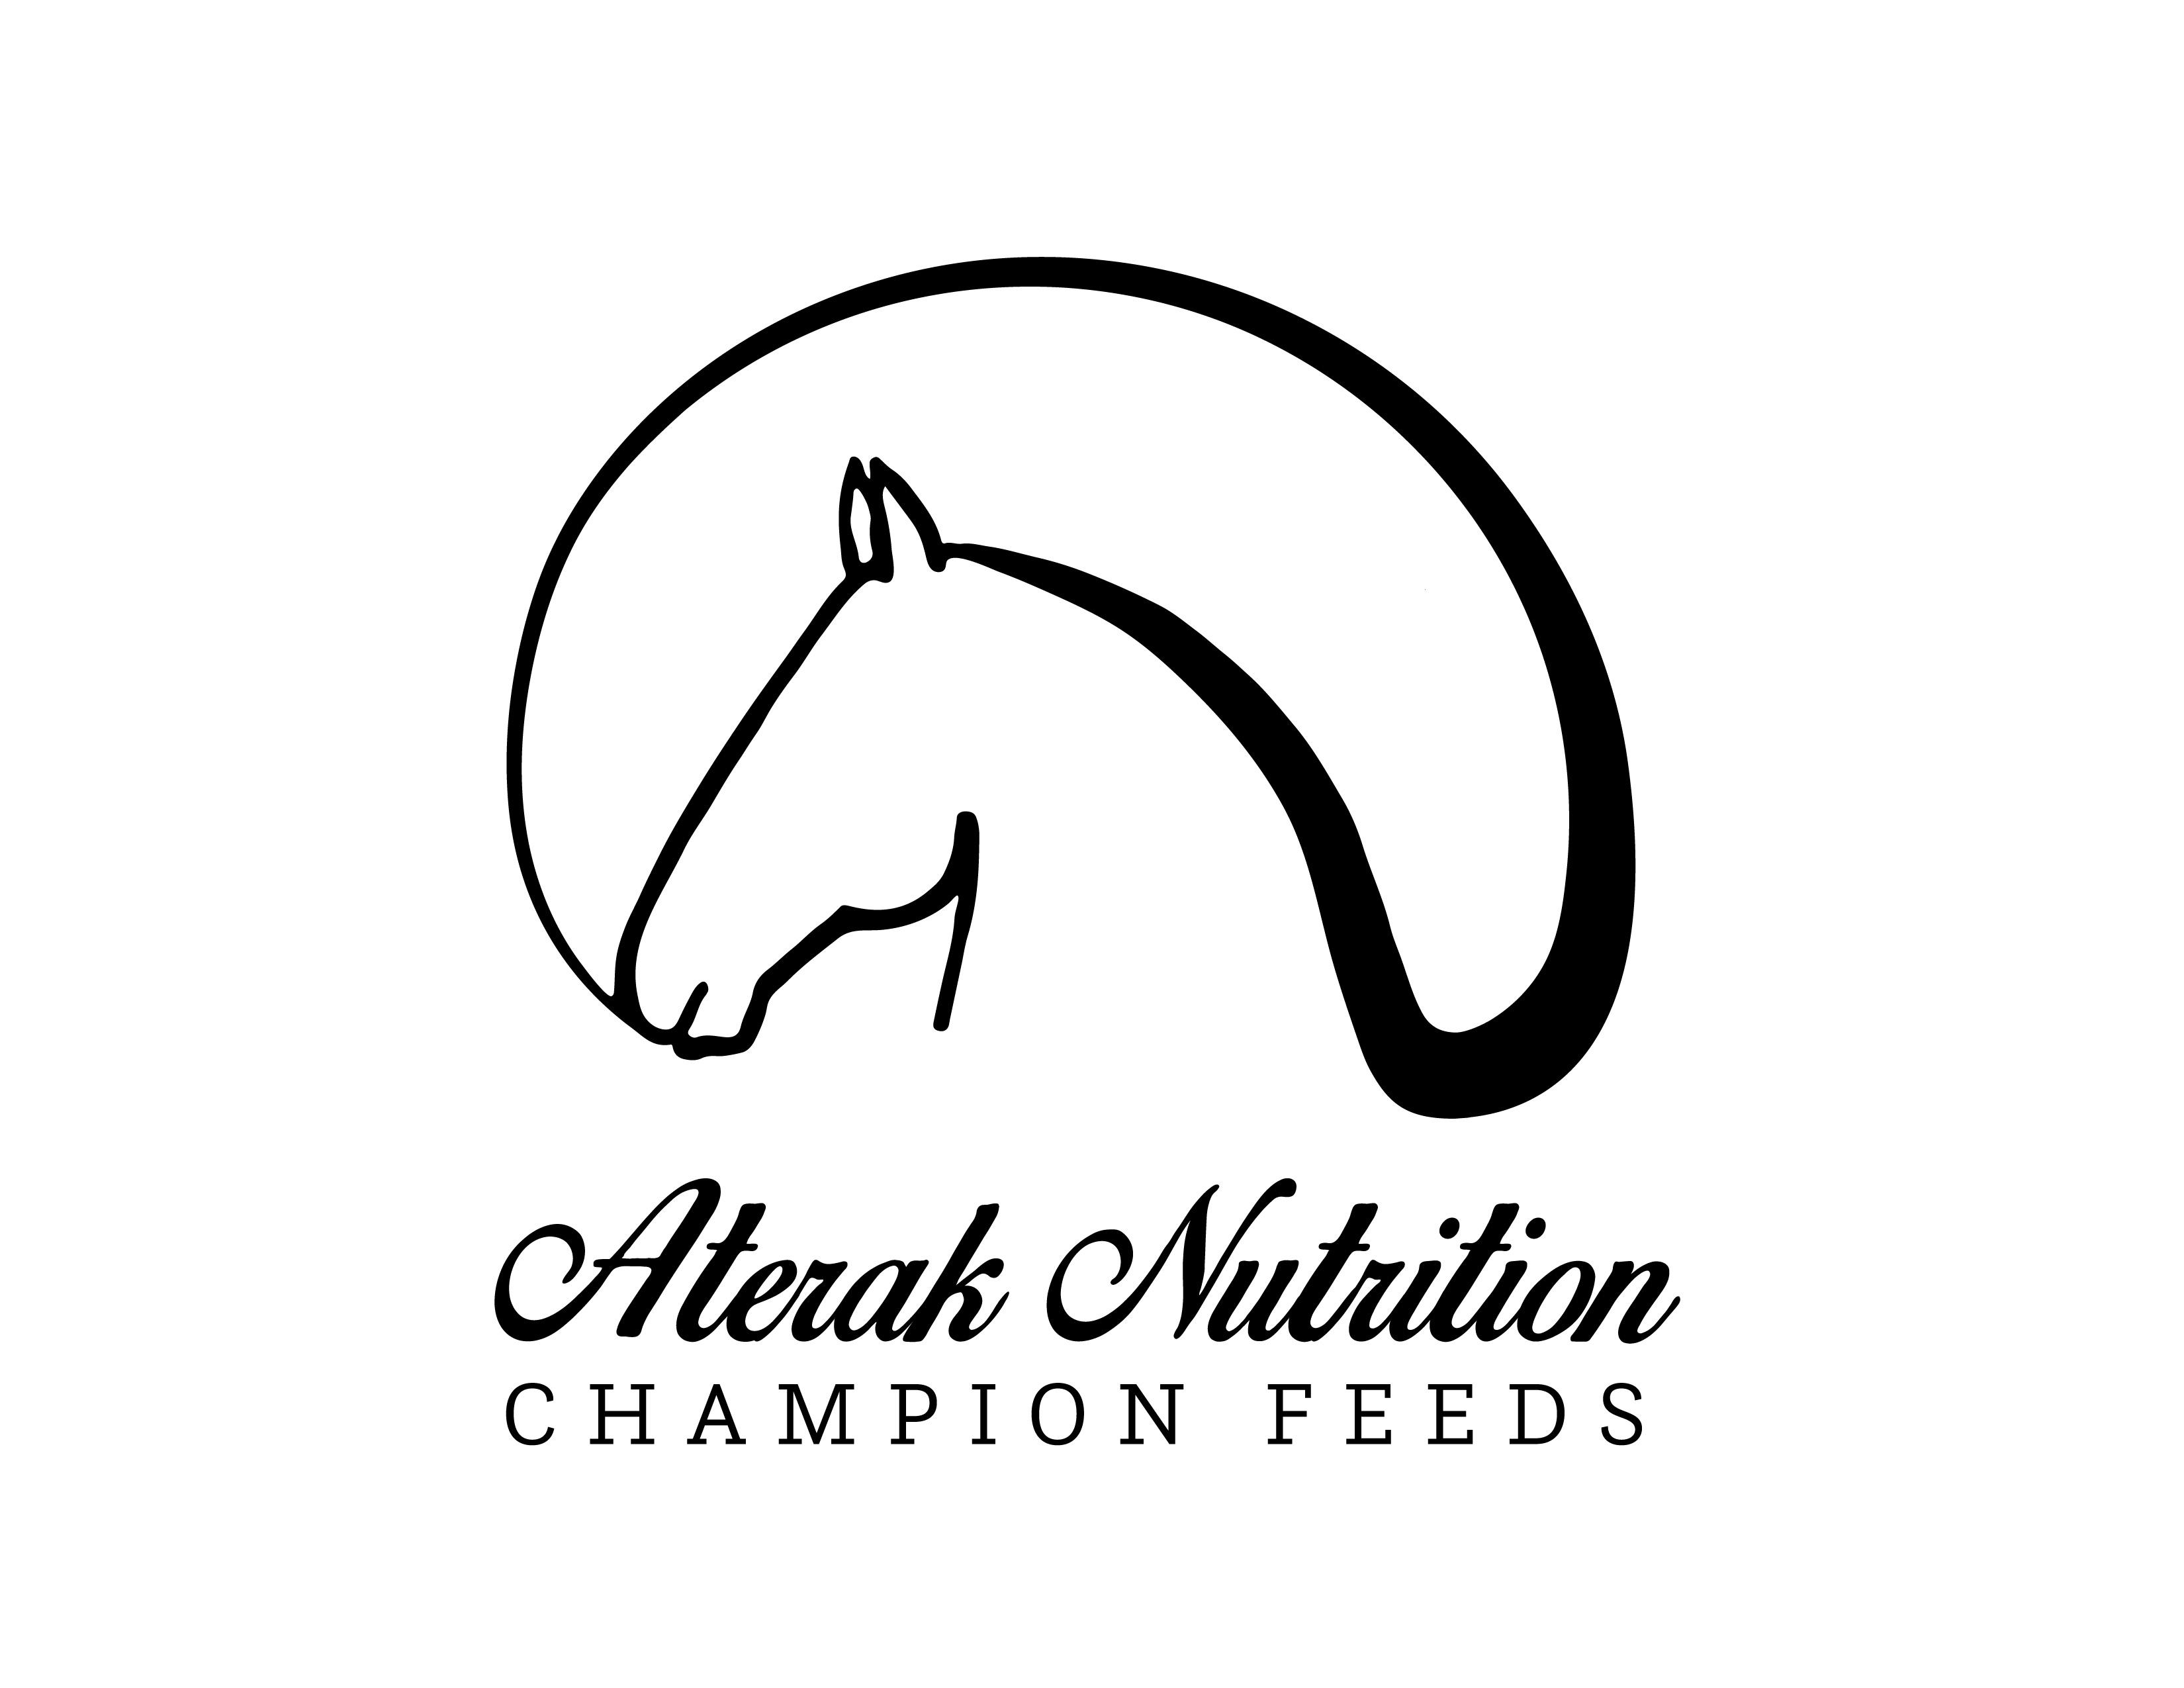 Aterak Nutrition